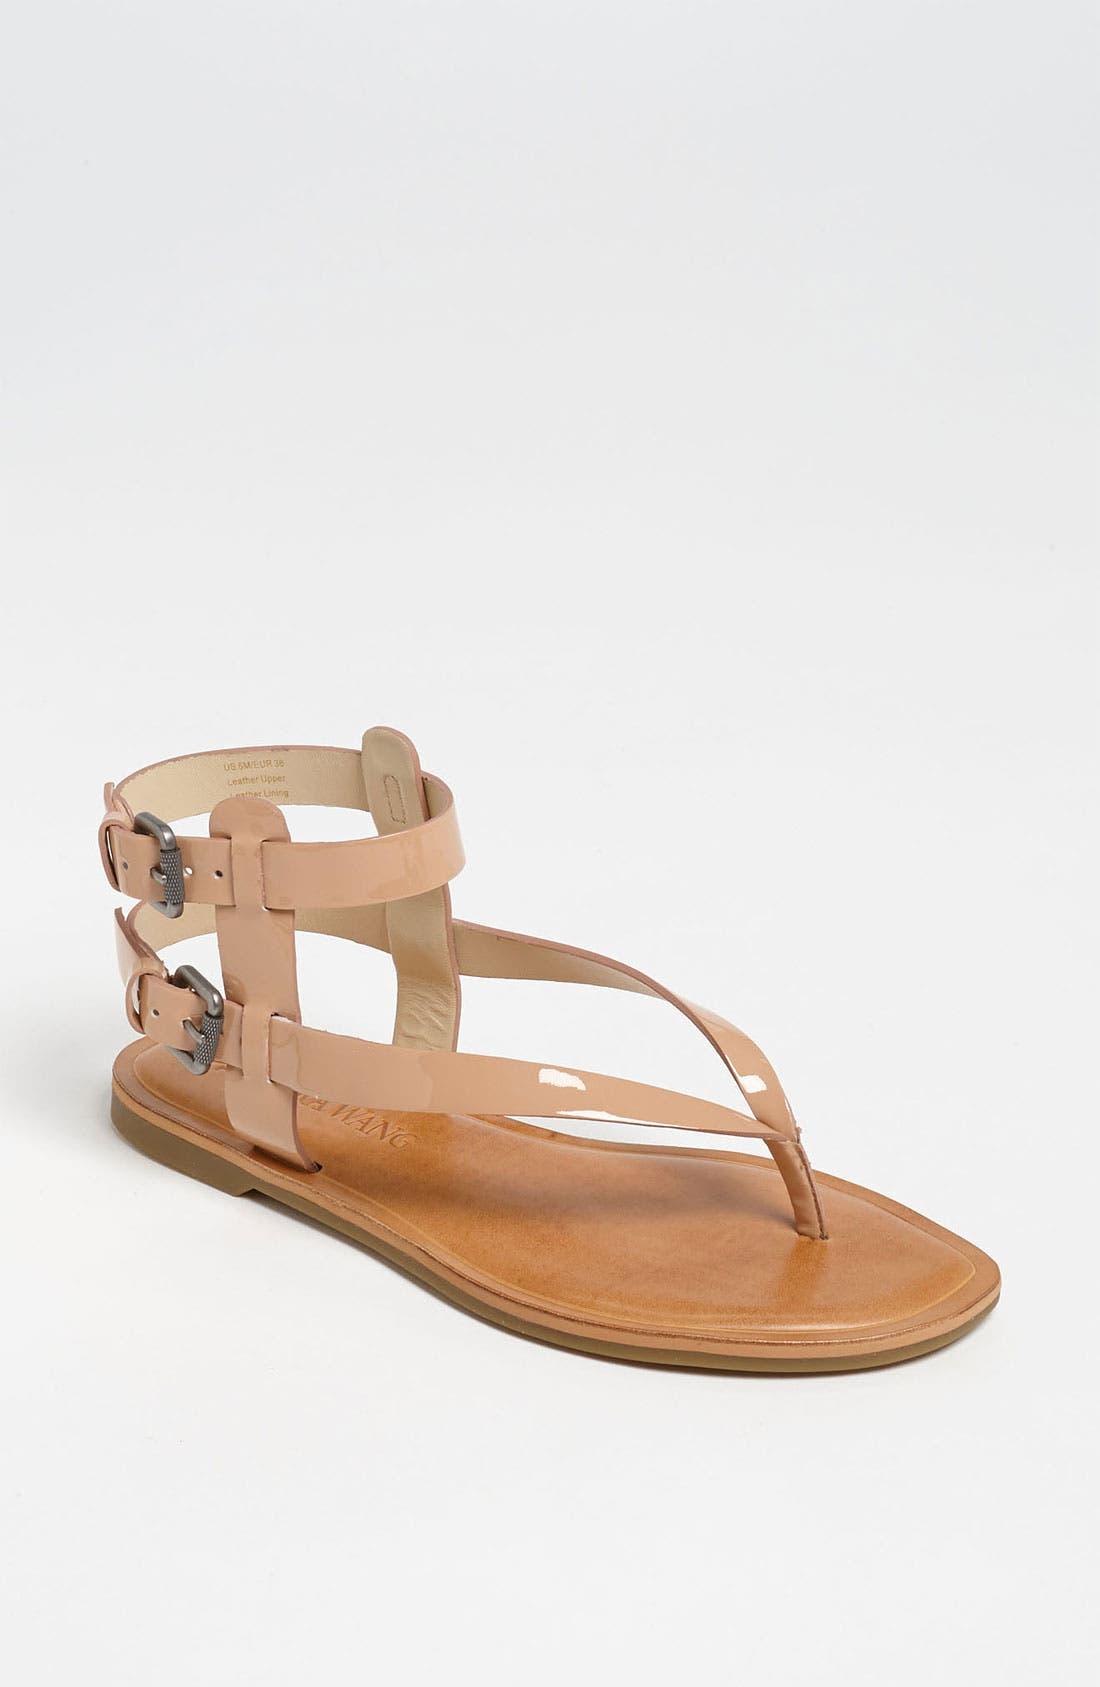 Alternate Image 1 Selected - Vera Wang Footwear 'Alena' Sandal (Online Only)